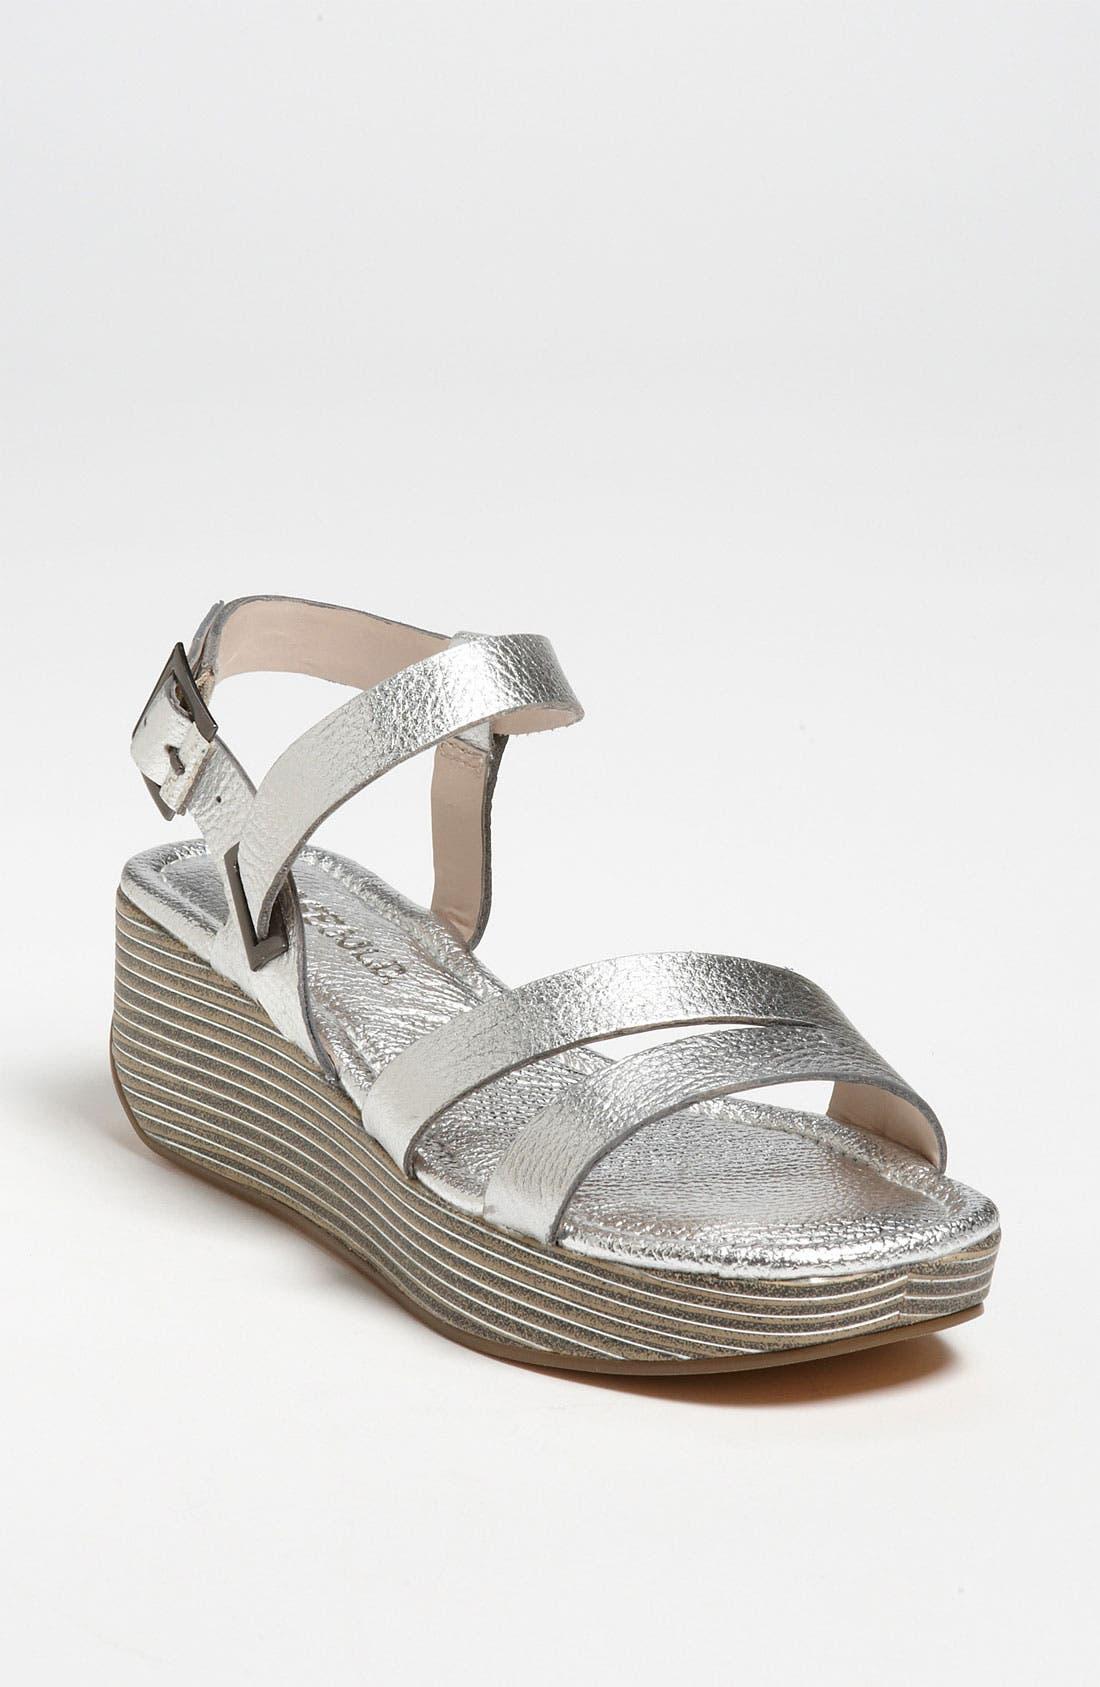 Main Image - Rosegold 'Hanna' Sandal